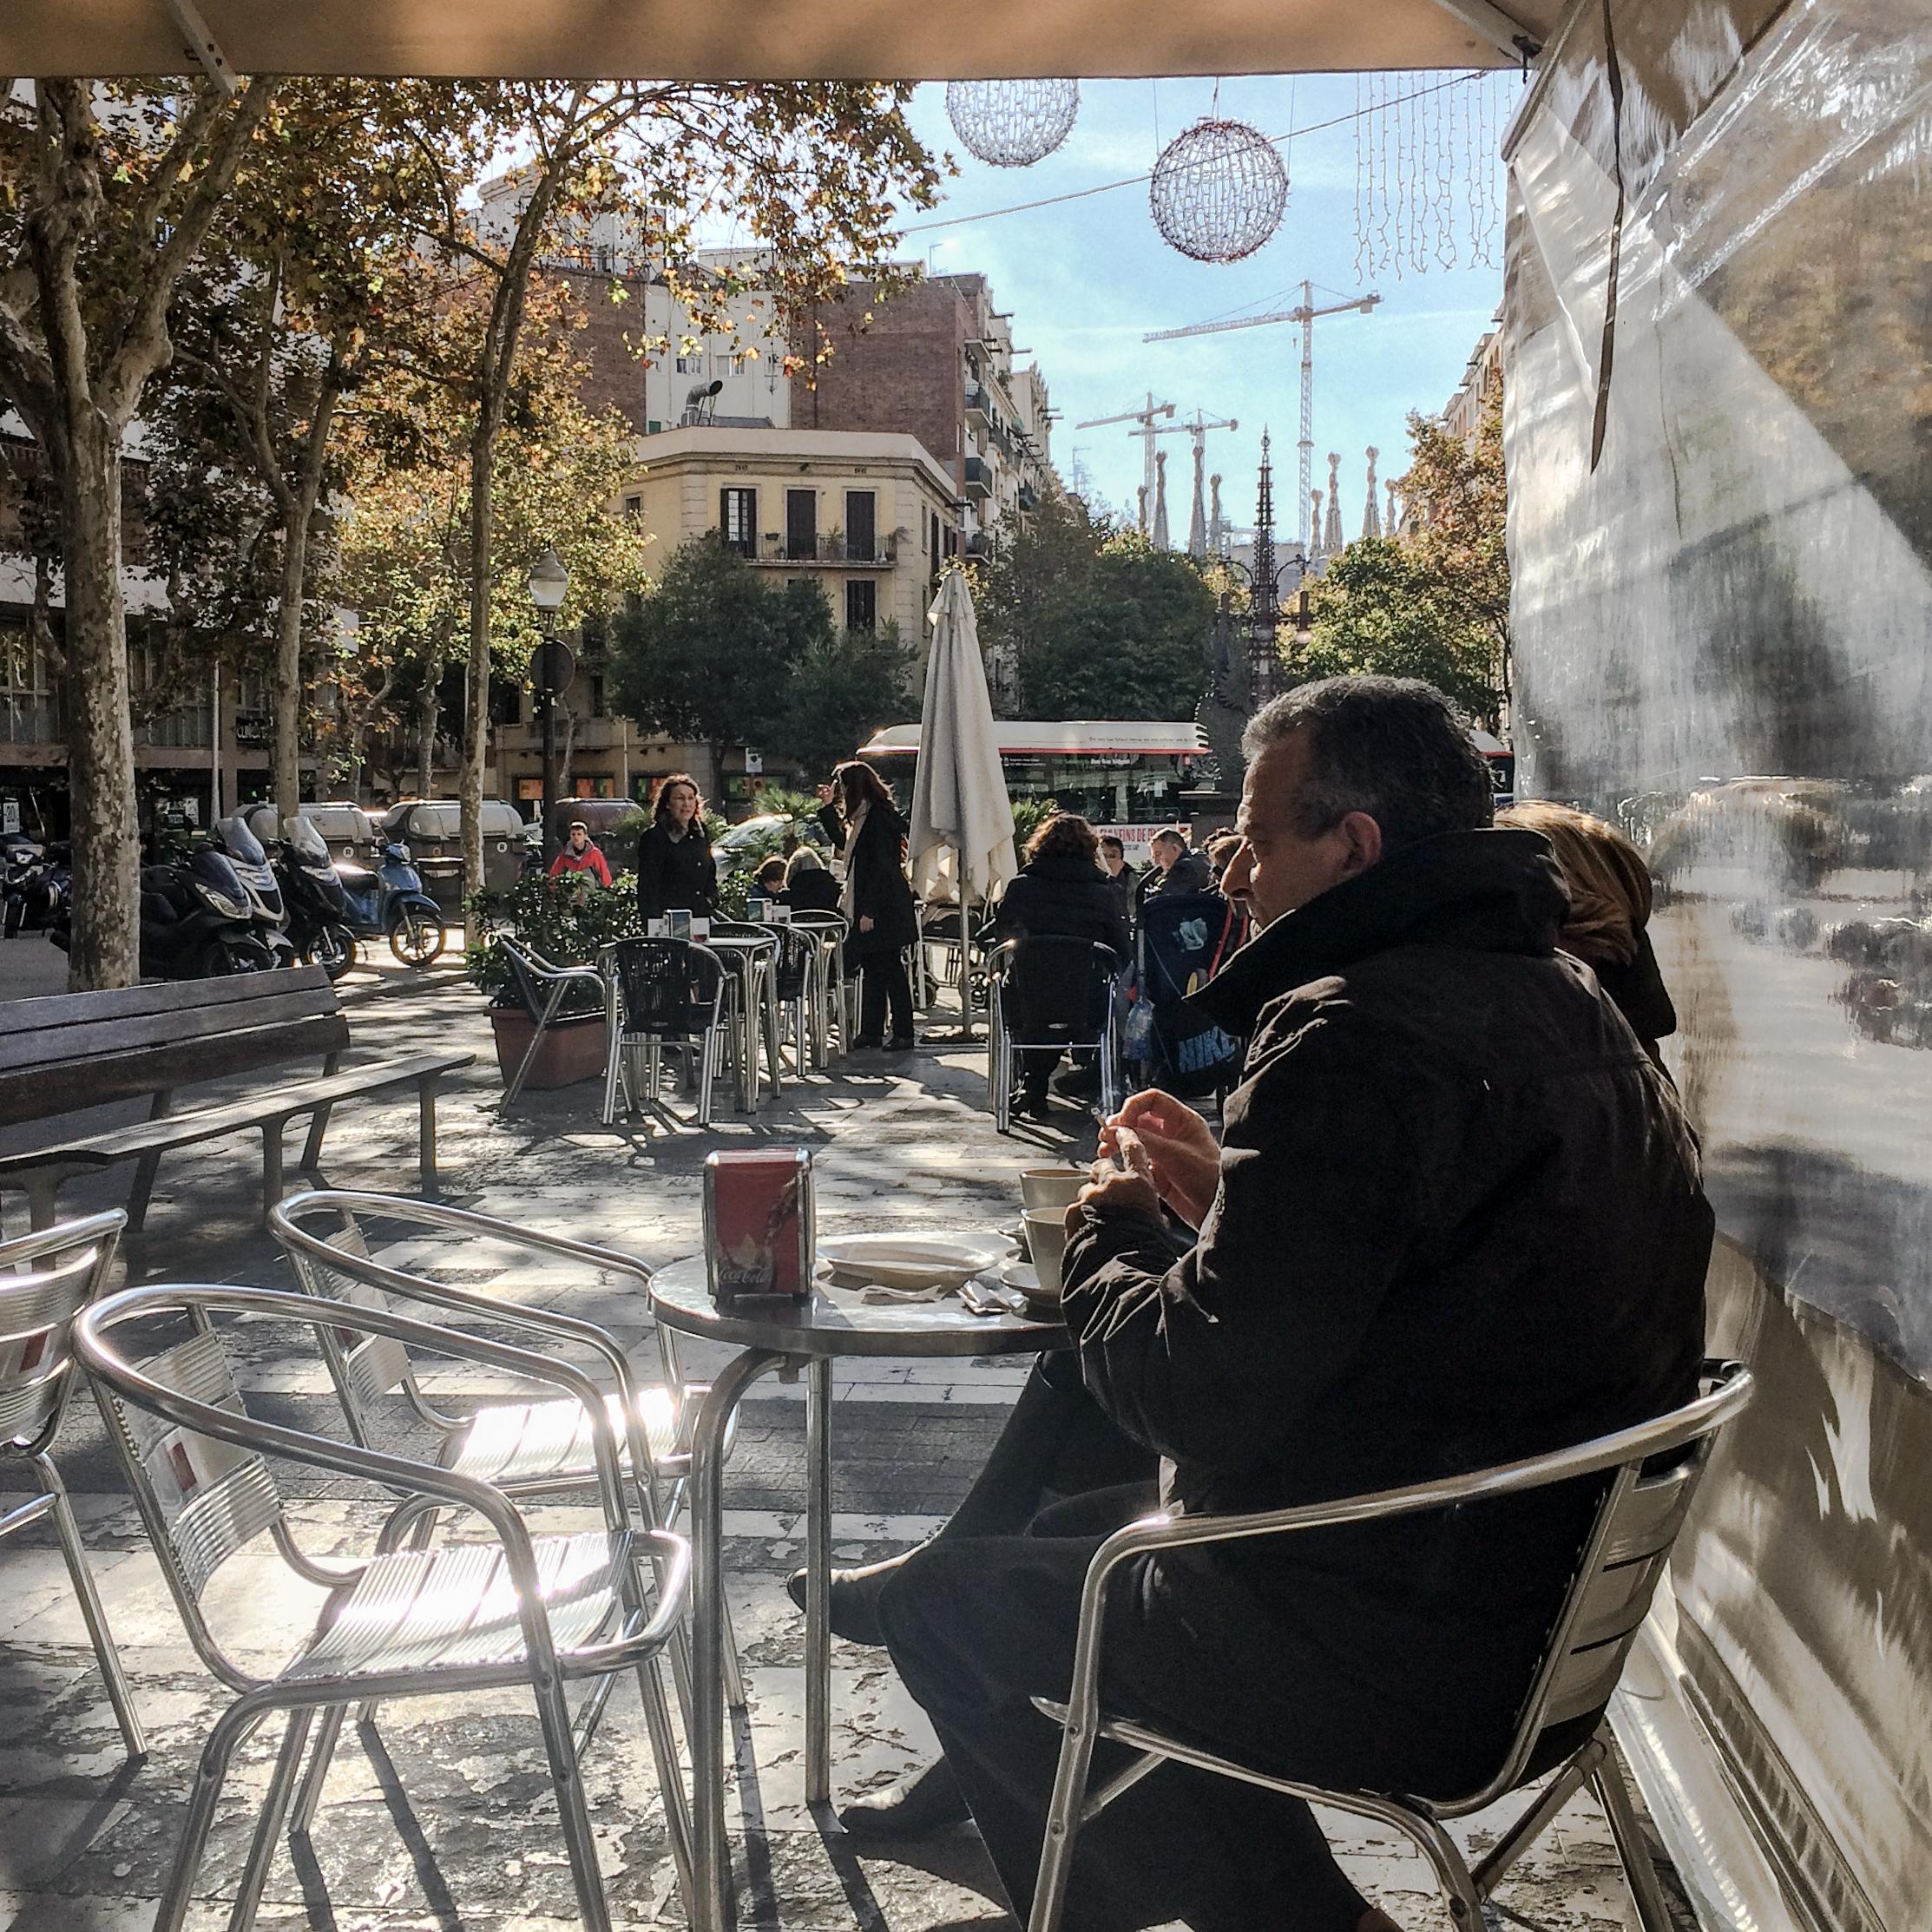 Avenida de Gaudi